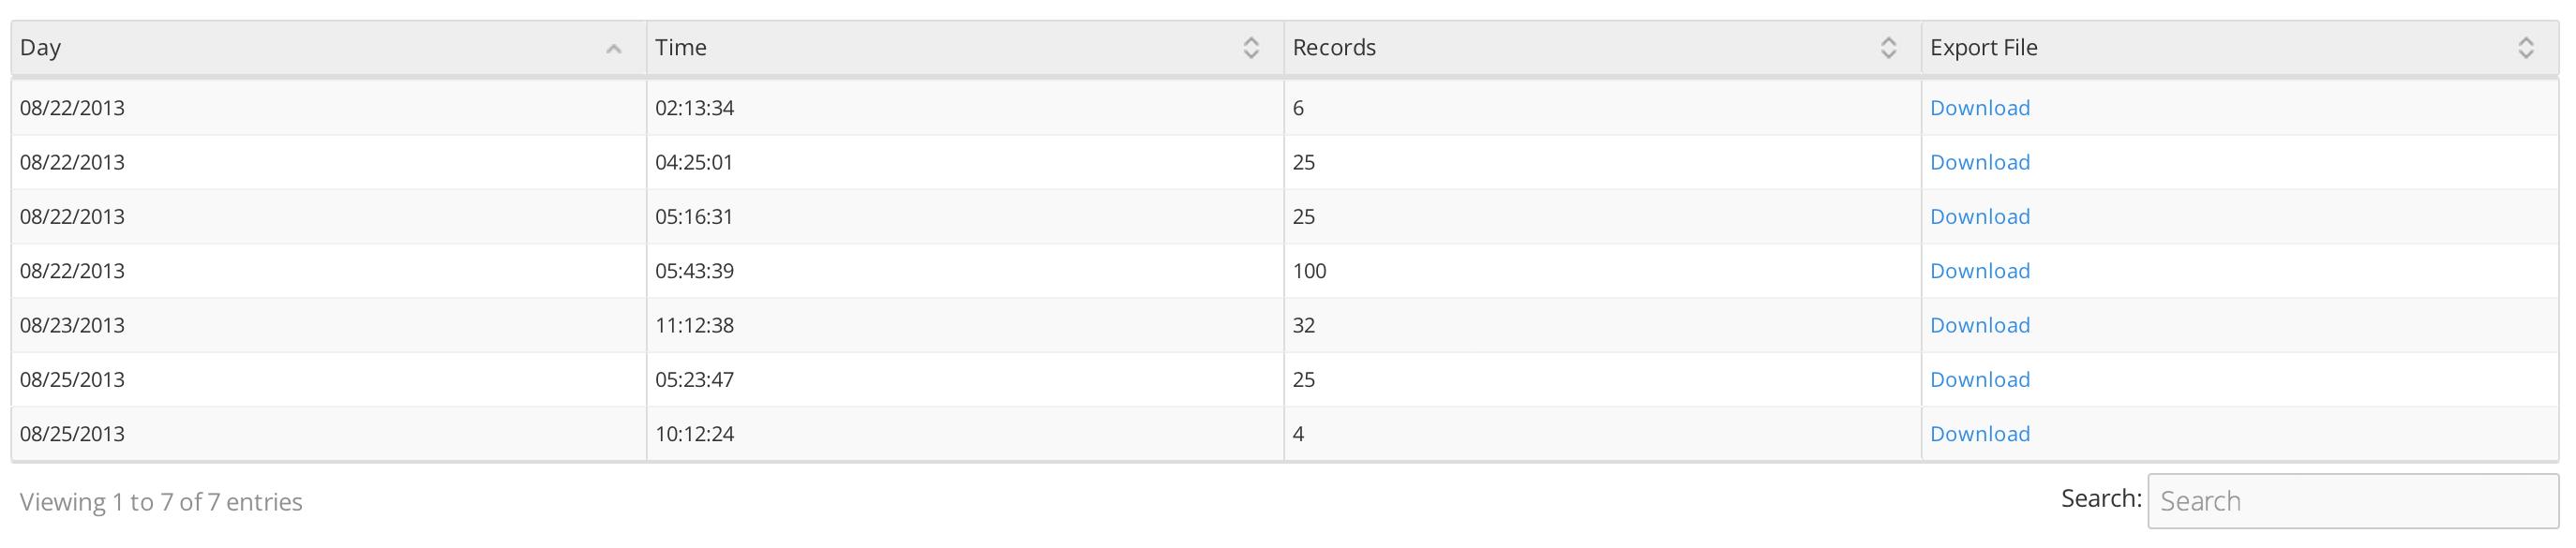 User export history.